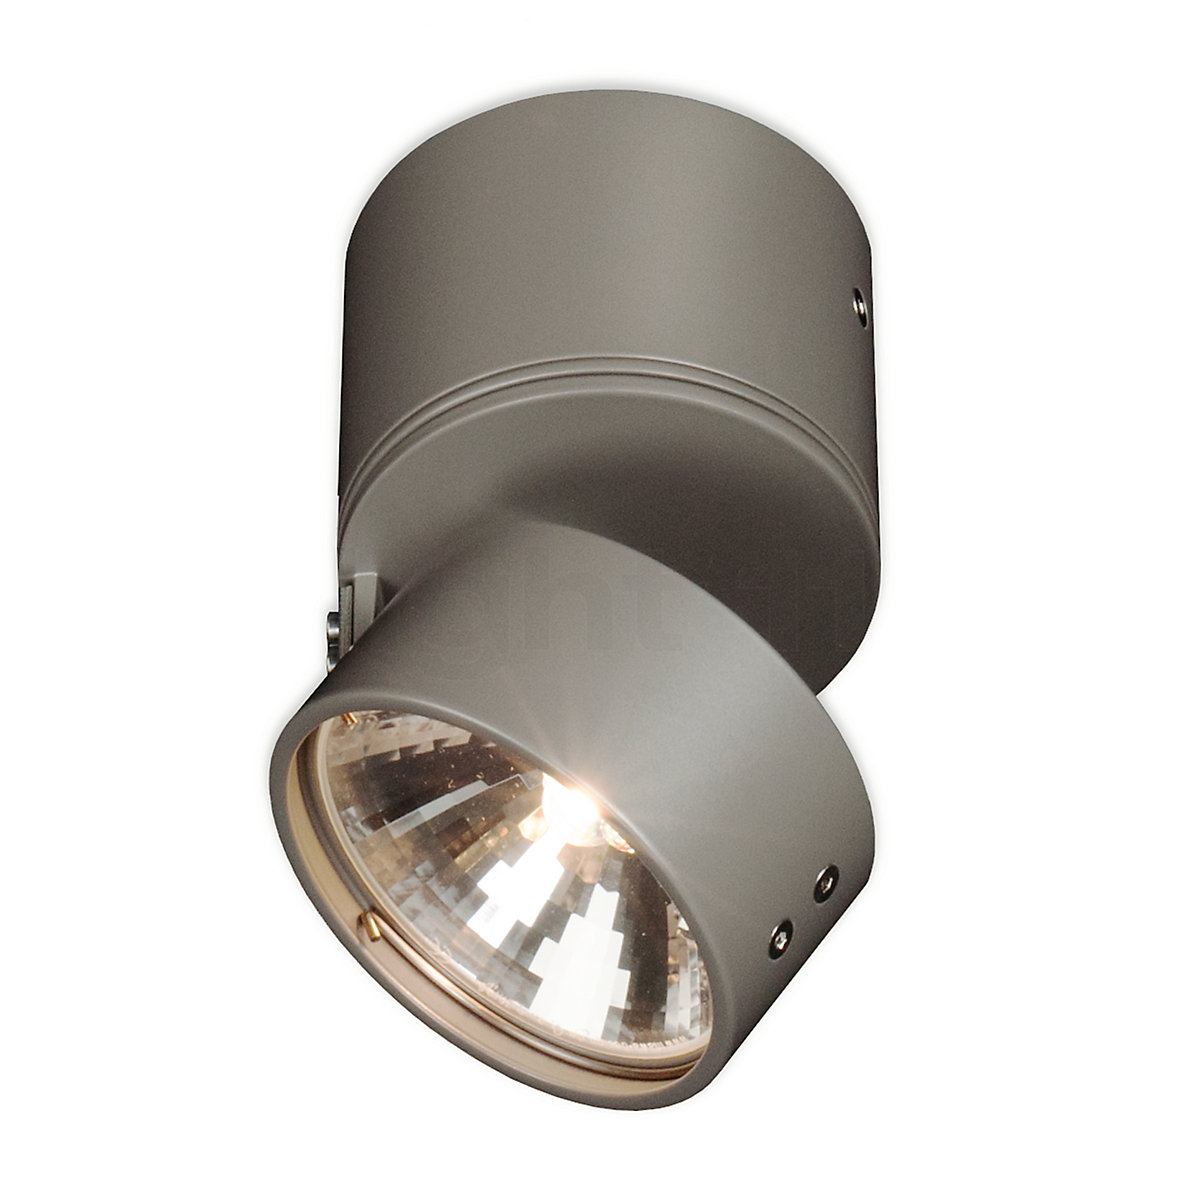 Lampade Attaccate Al Soffitto mawa wittenberg fernrohr lampada da soffitto